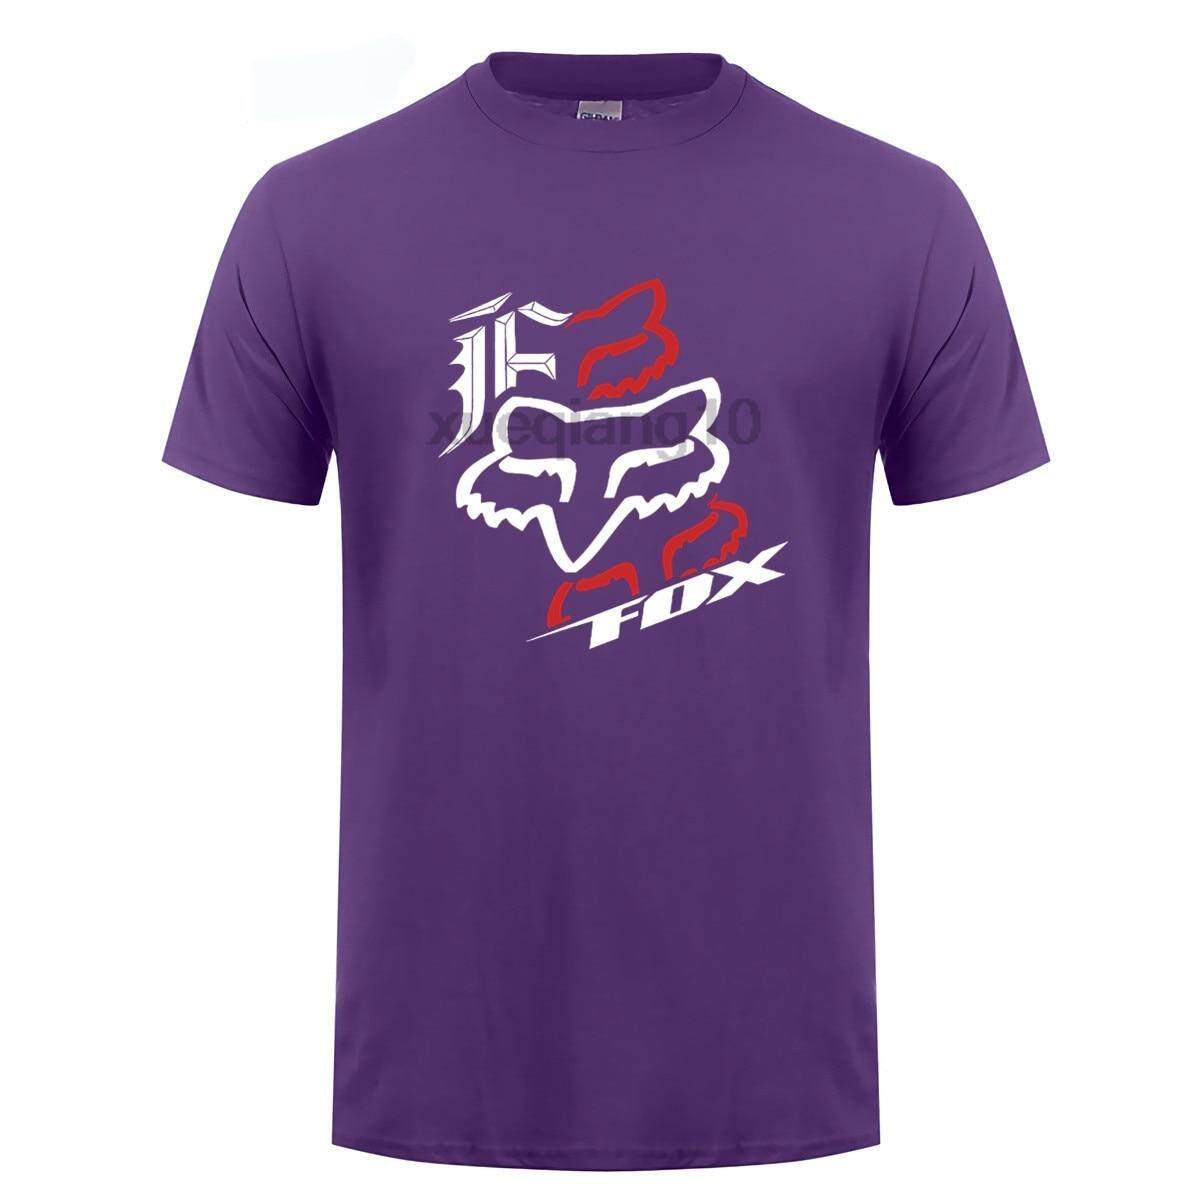 2022 best sell tshirt fox racing t-shirt logo clothing desktop wallpaper